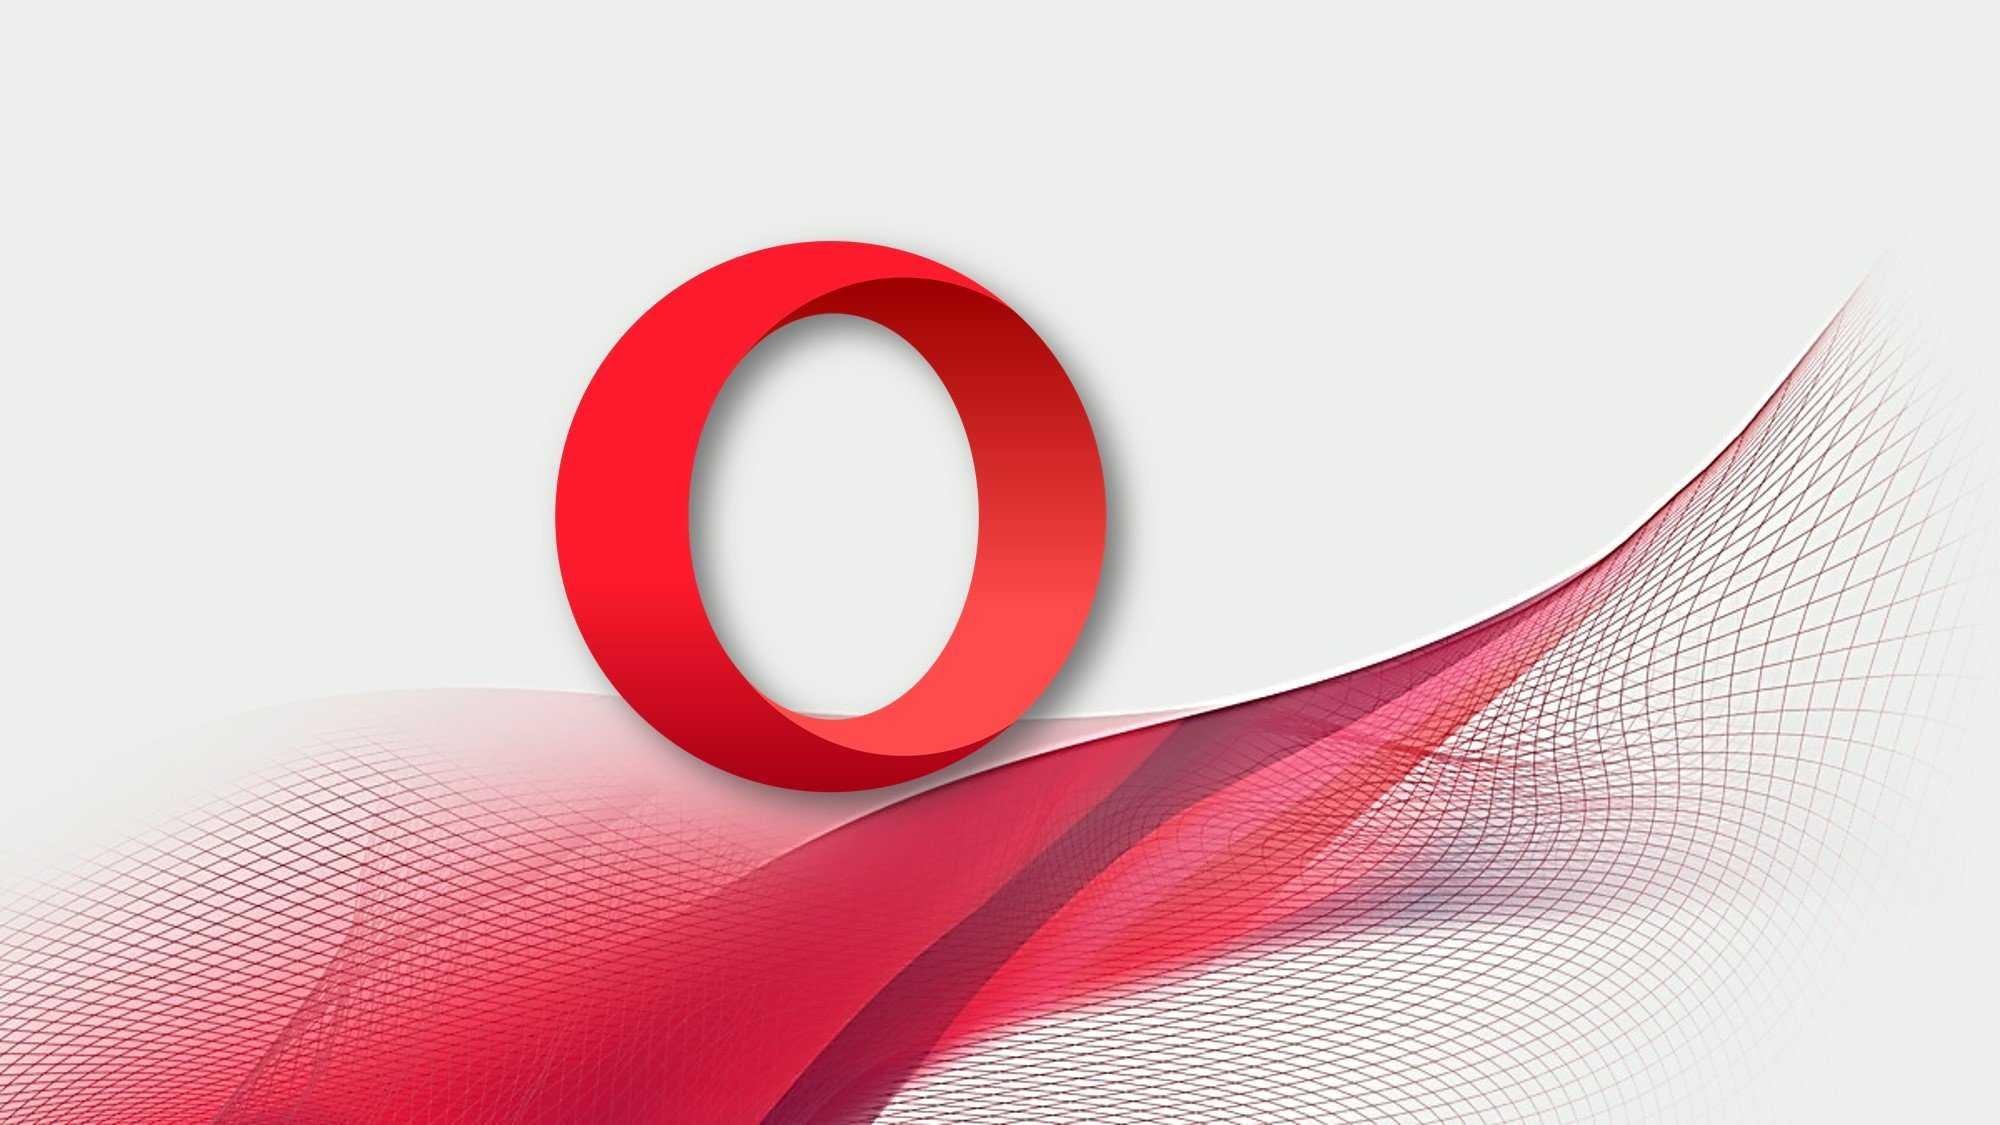 تحميل متصفح اوبرا للكمبيوتر 2019 Opera Browser Download - دايركت أب